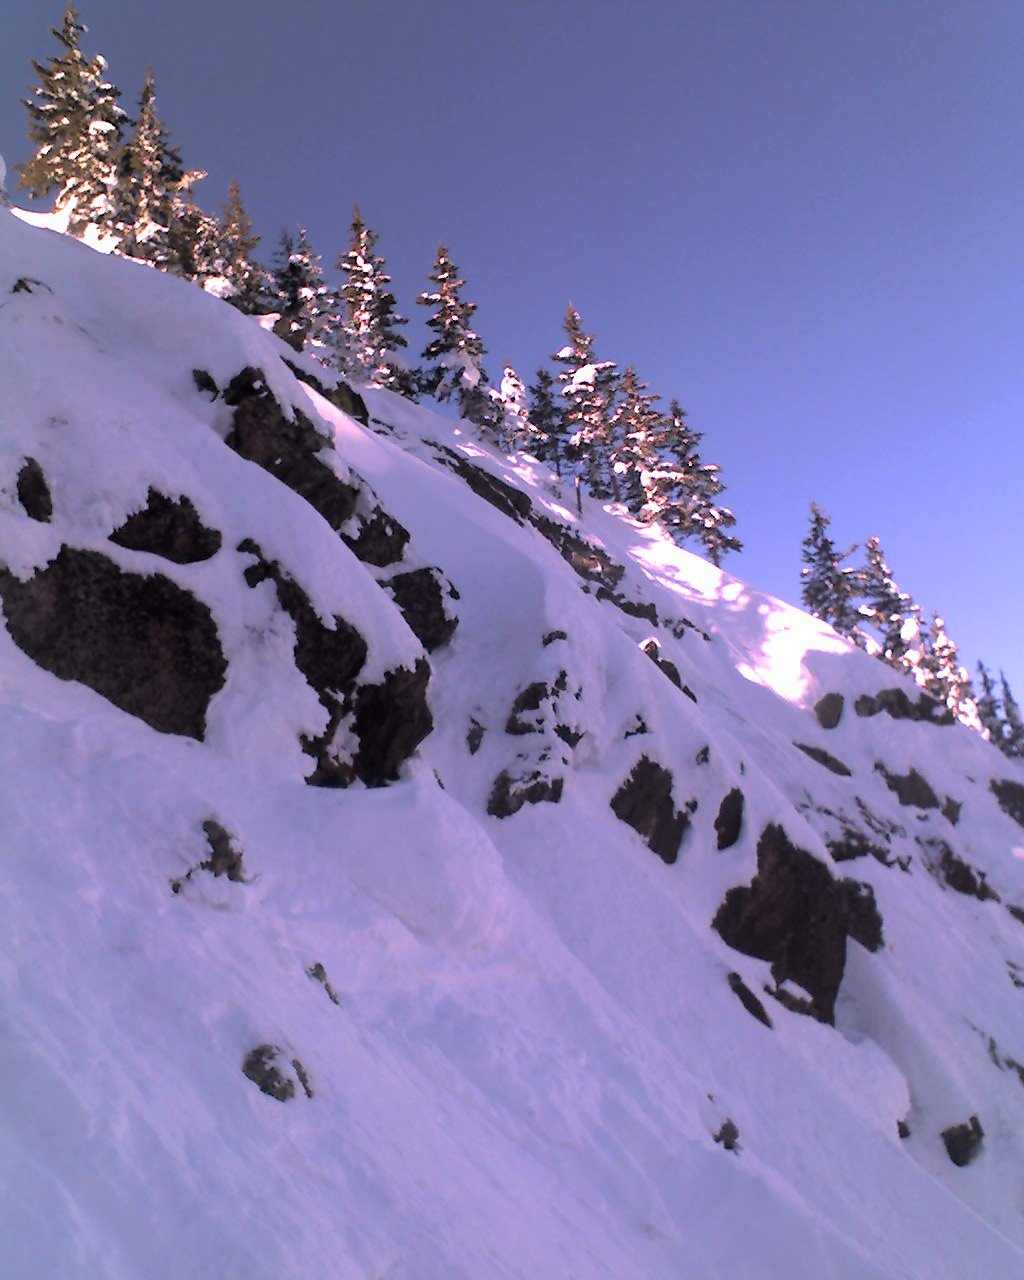 Skiing - 7 of 18